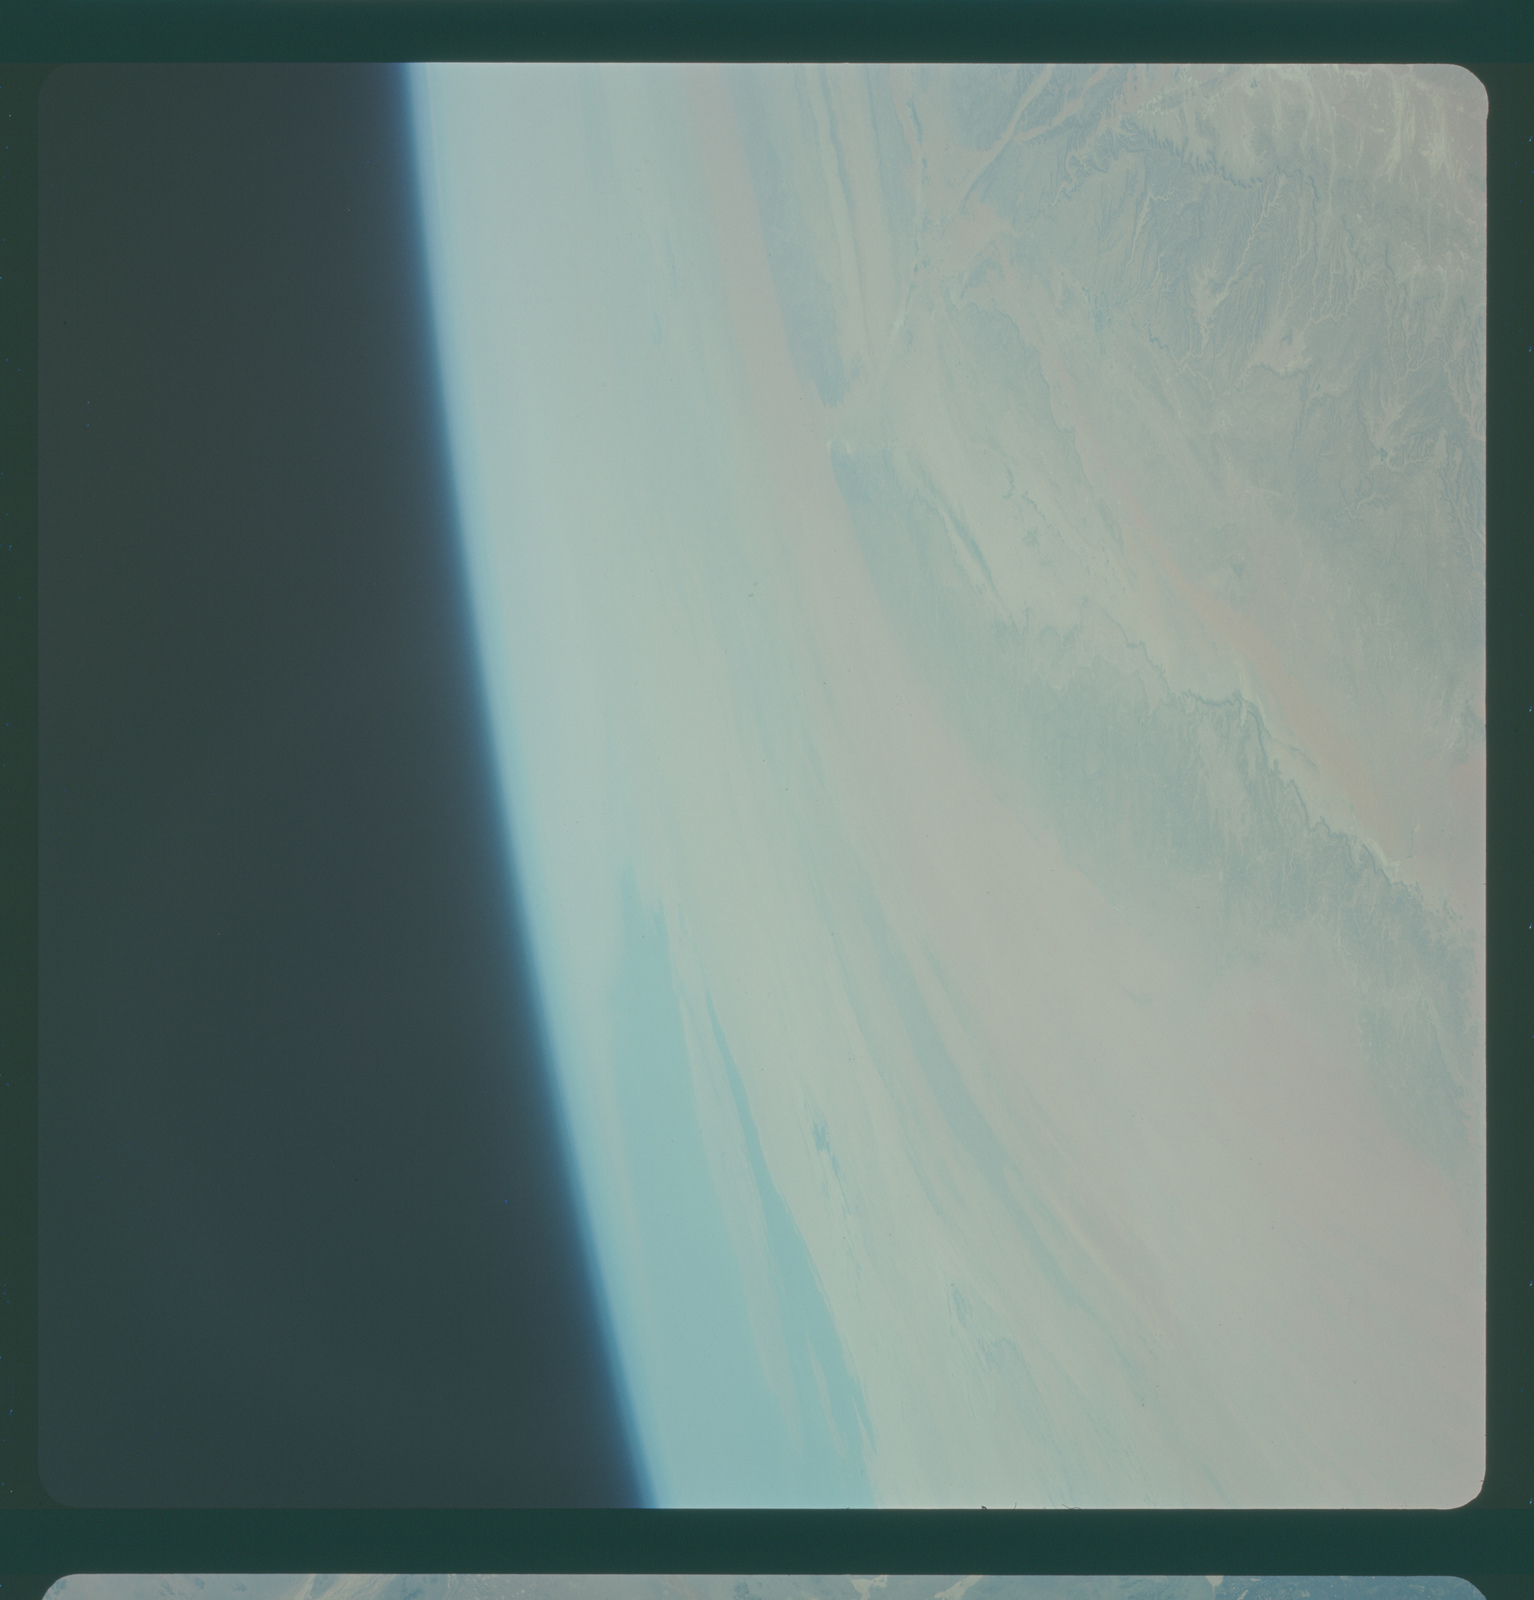 Gemini IV Mission Image -  Central Saudi Arabia